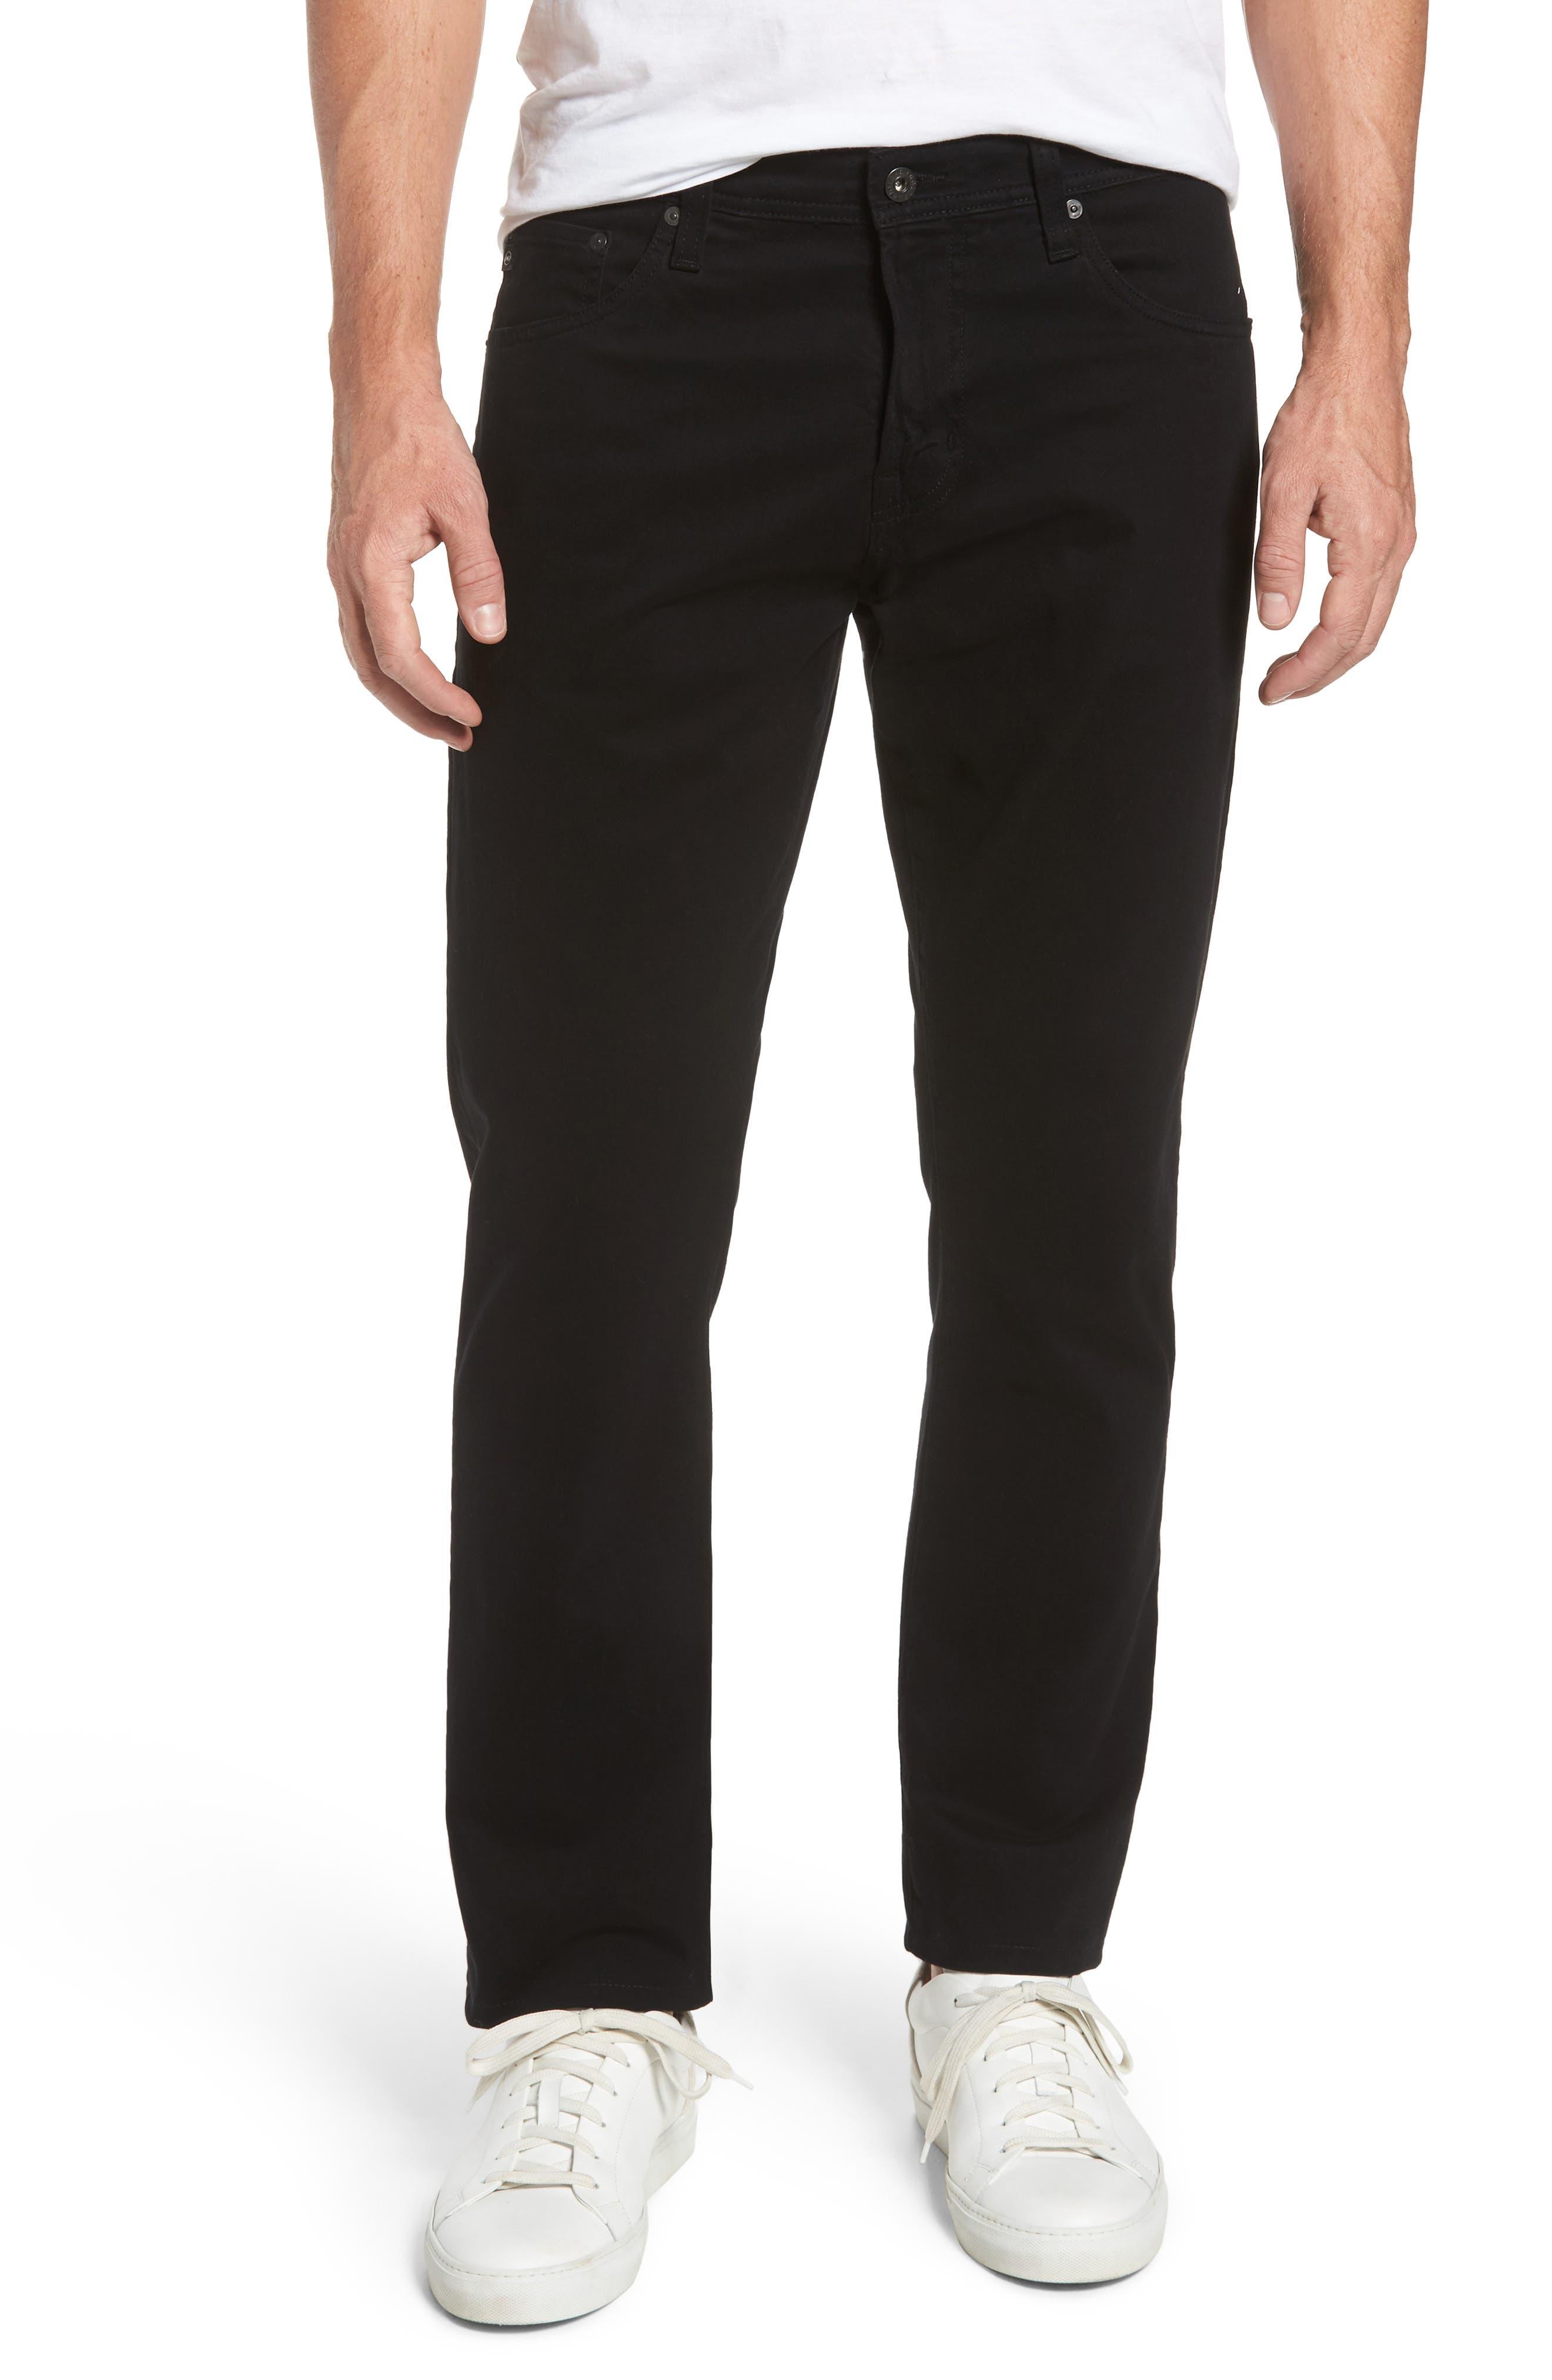 Ives SUD Straight Leg Pants,                             Main thumbnail 1, color,                             SUPER BLACK